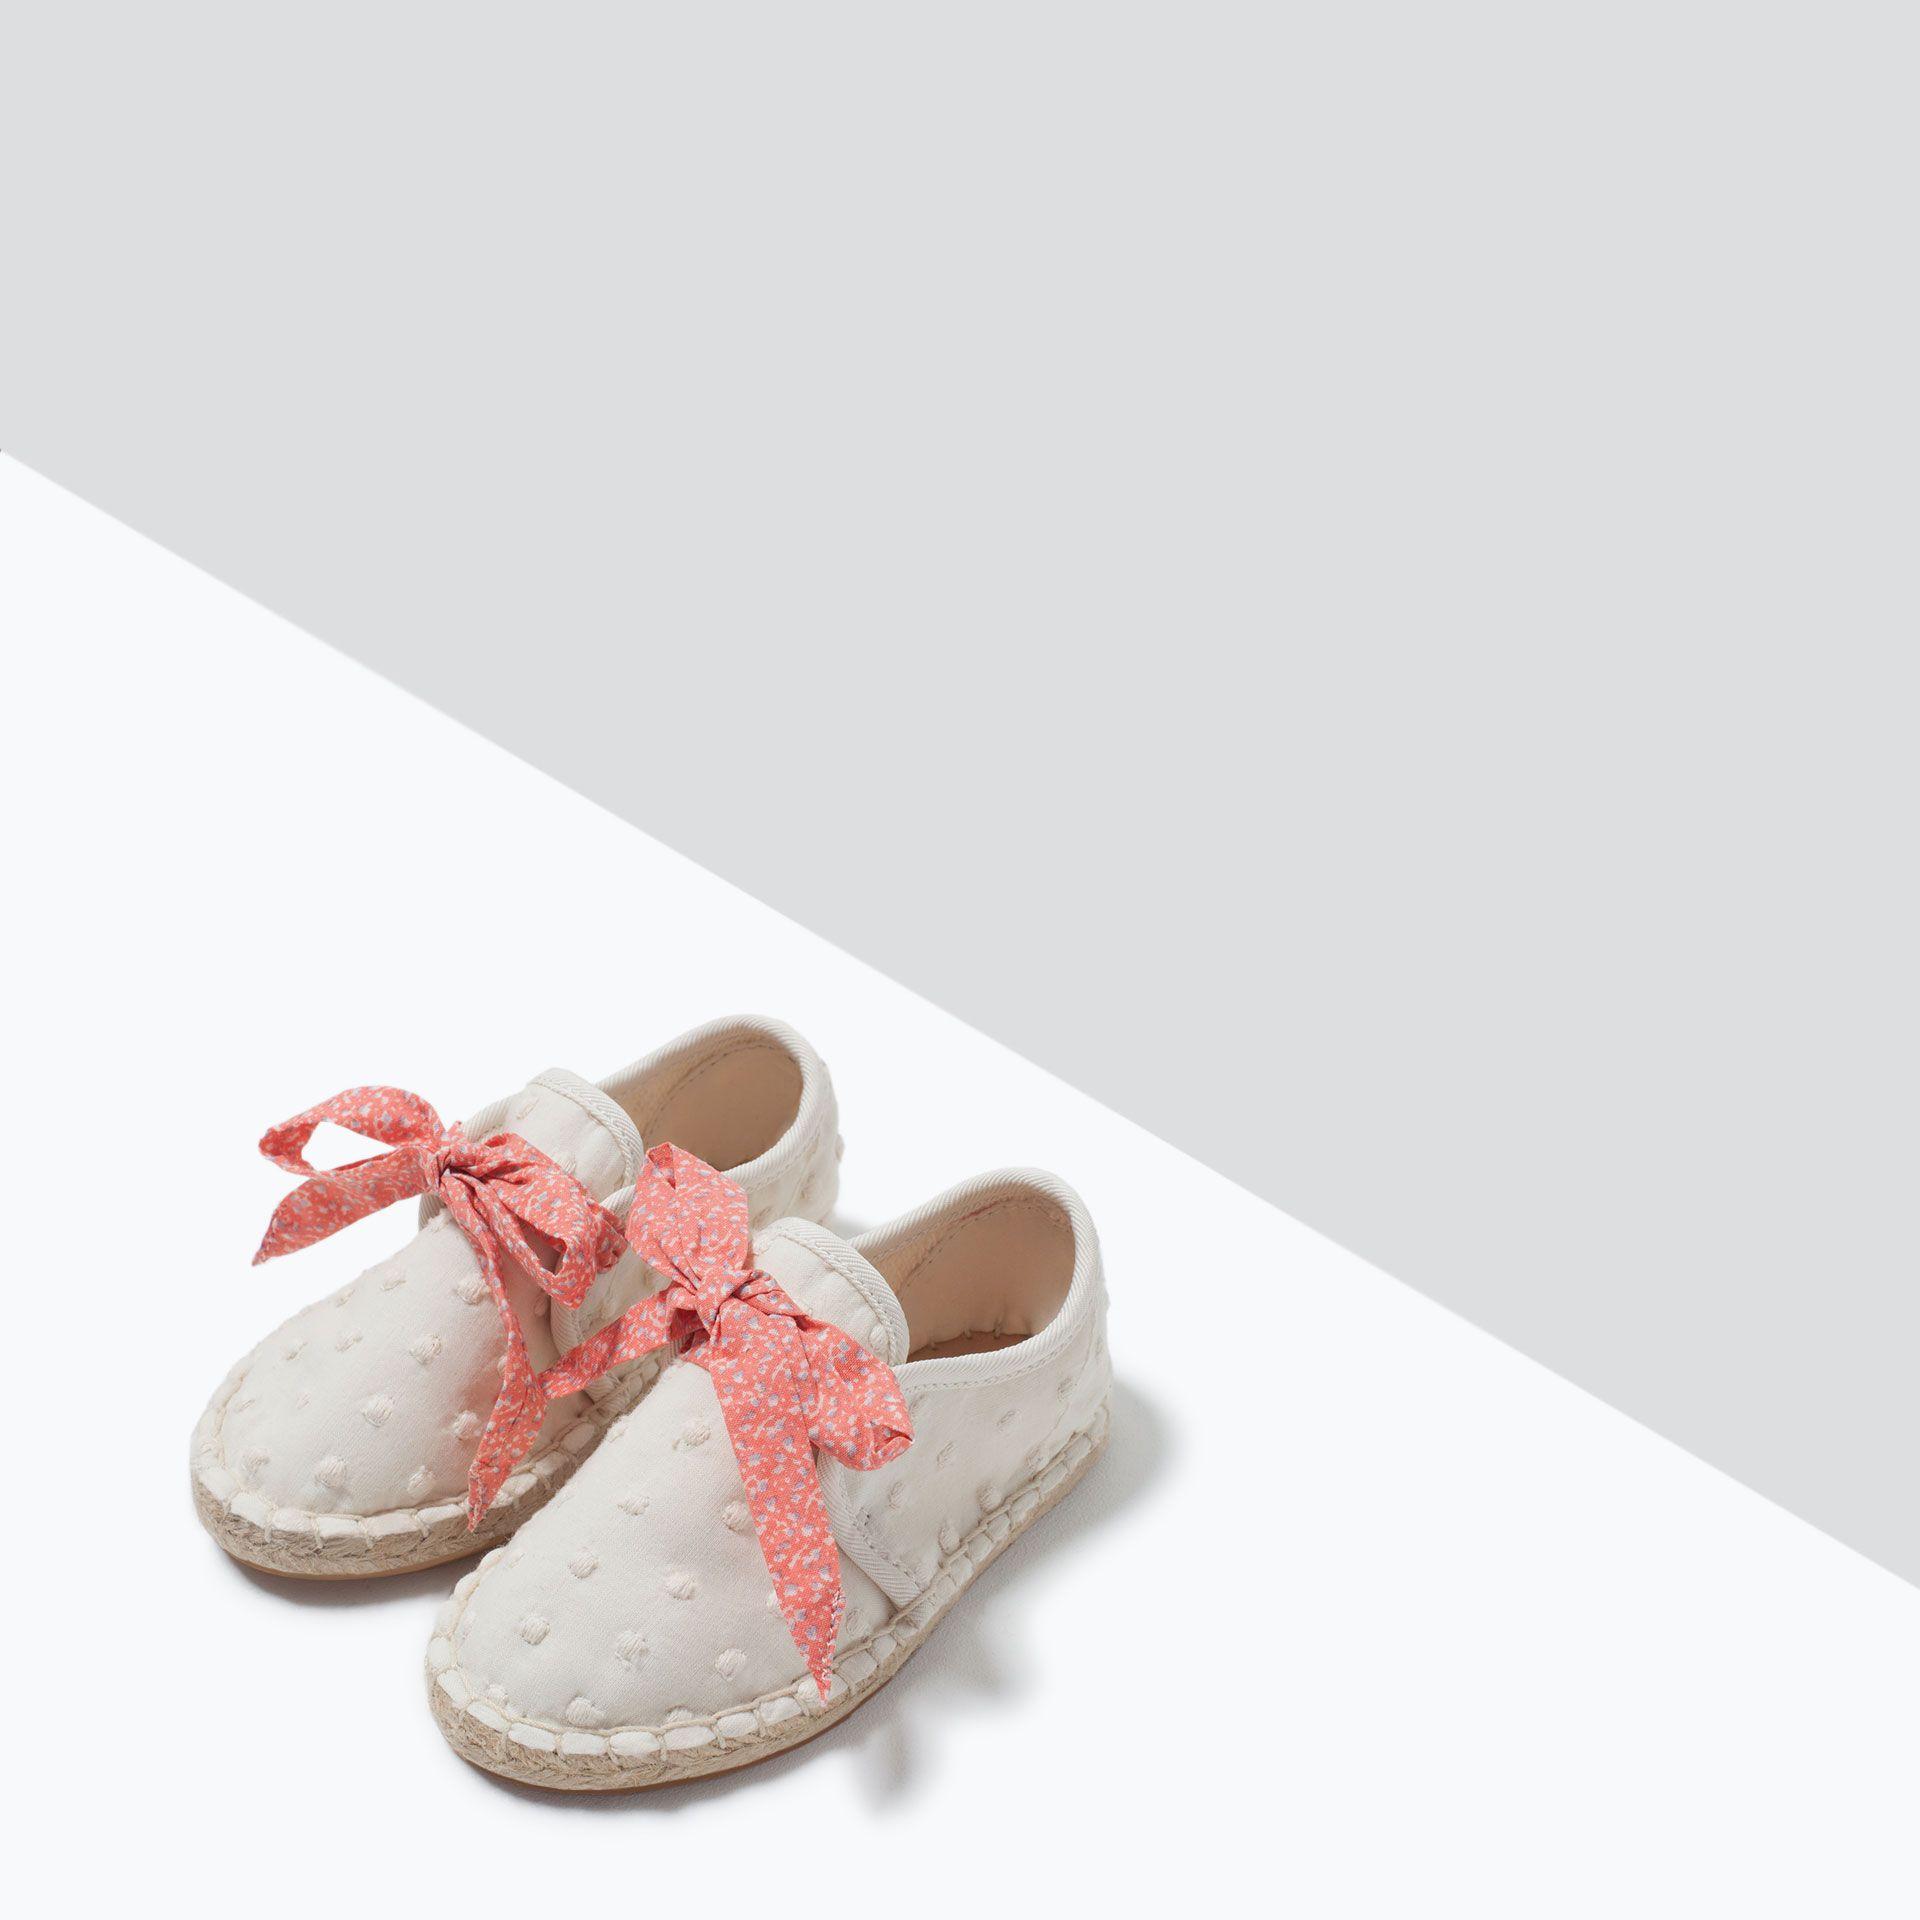 ZARA - KIDS - LACE-UP ESPADRILLE SNEAKERS | Toddler ...